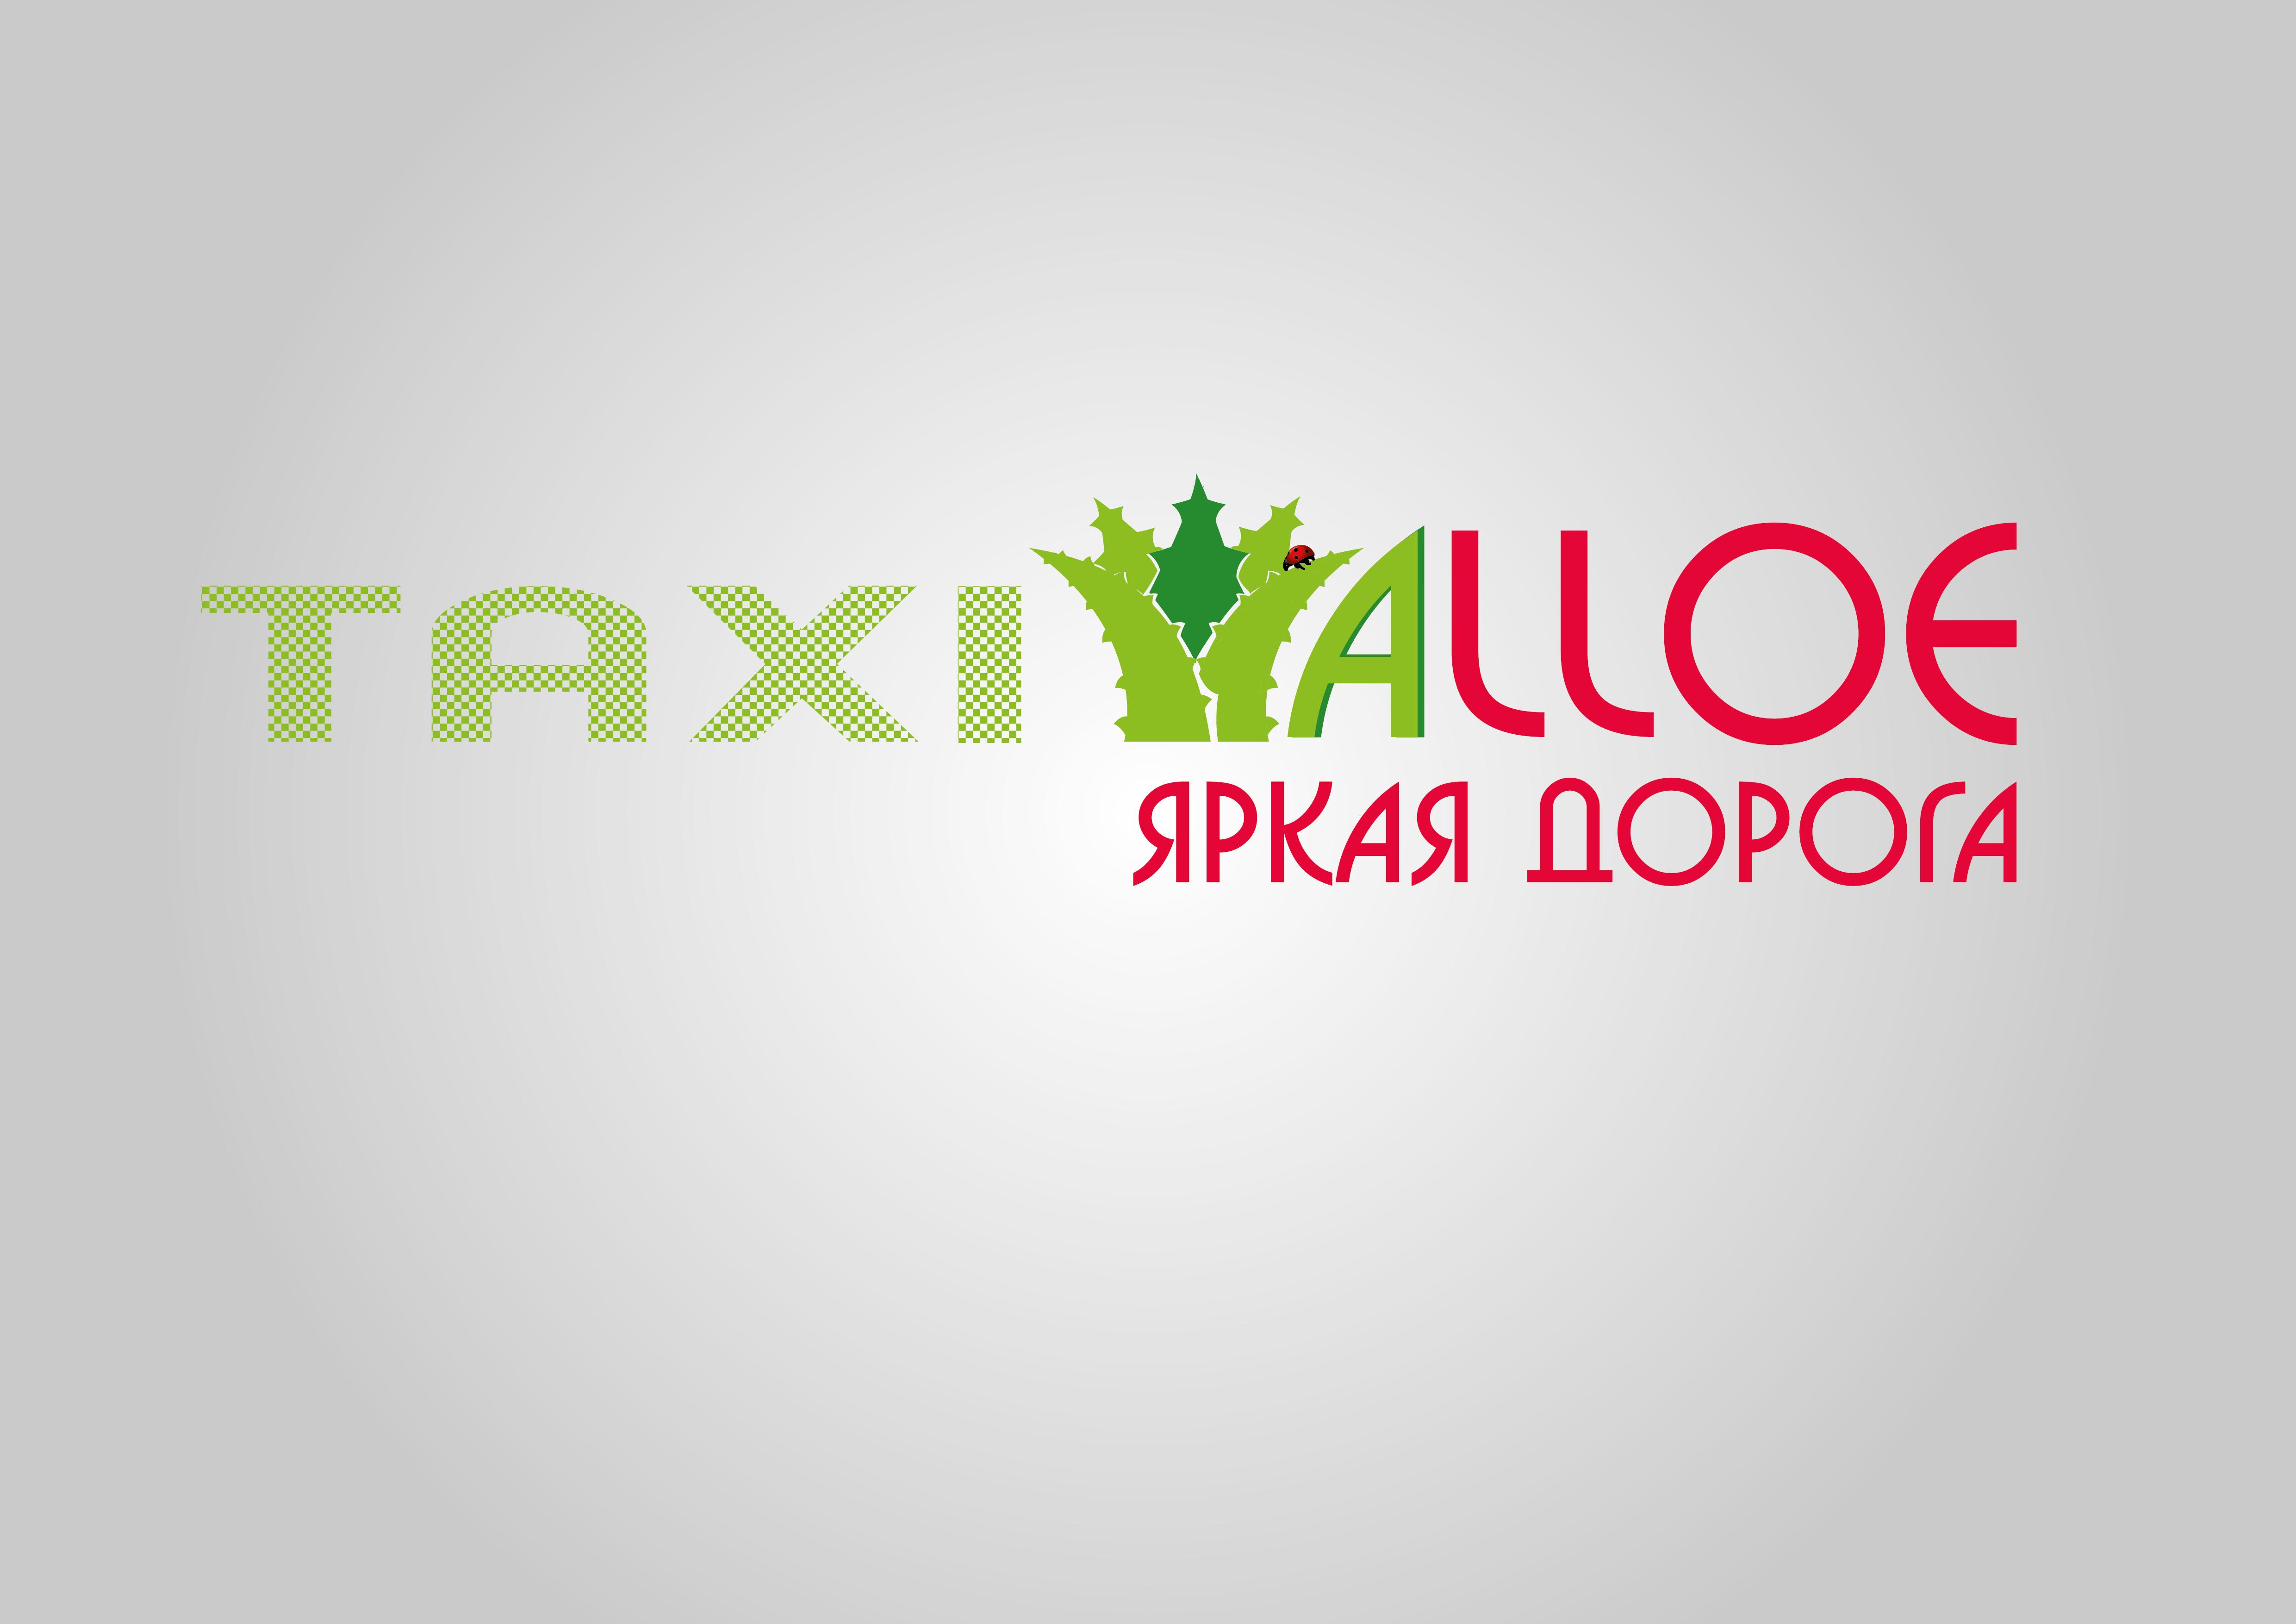 придумать логотип для такси фото f_726539cb338443ab.png